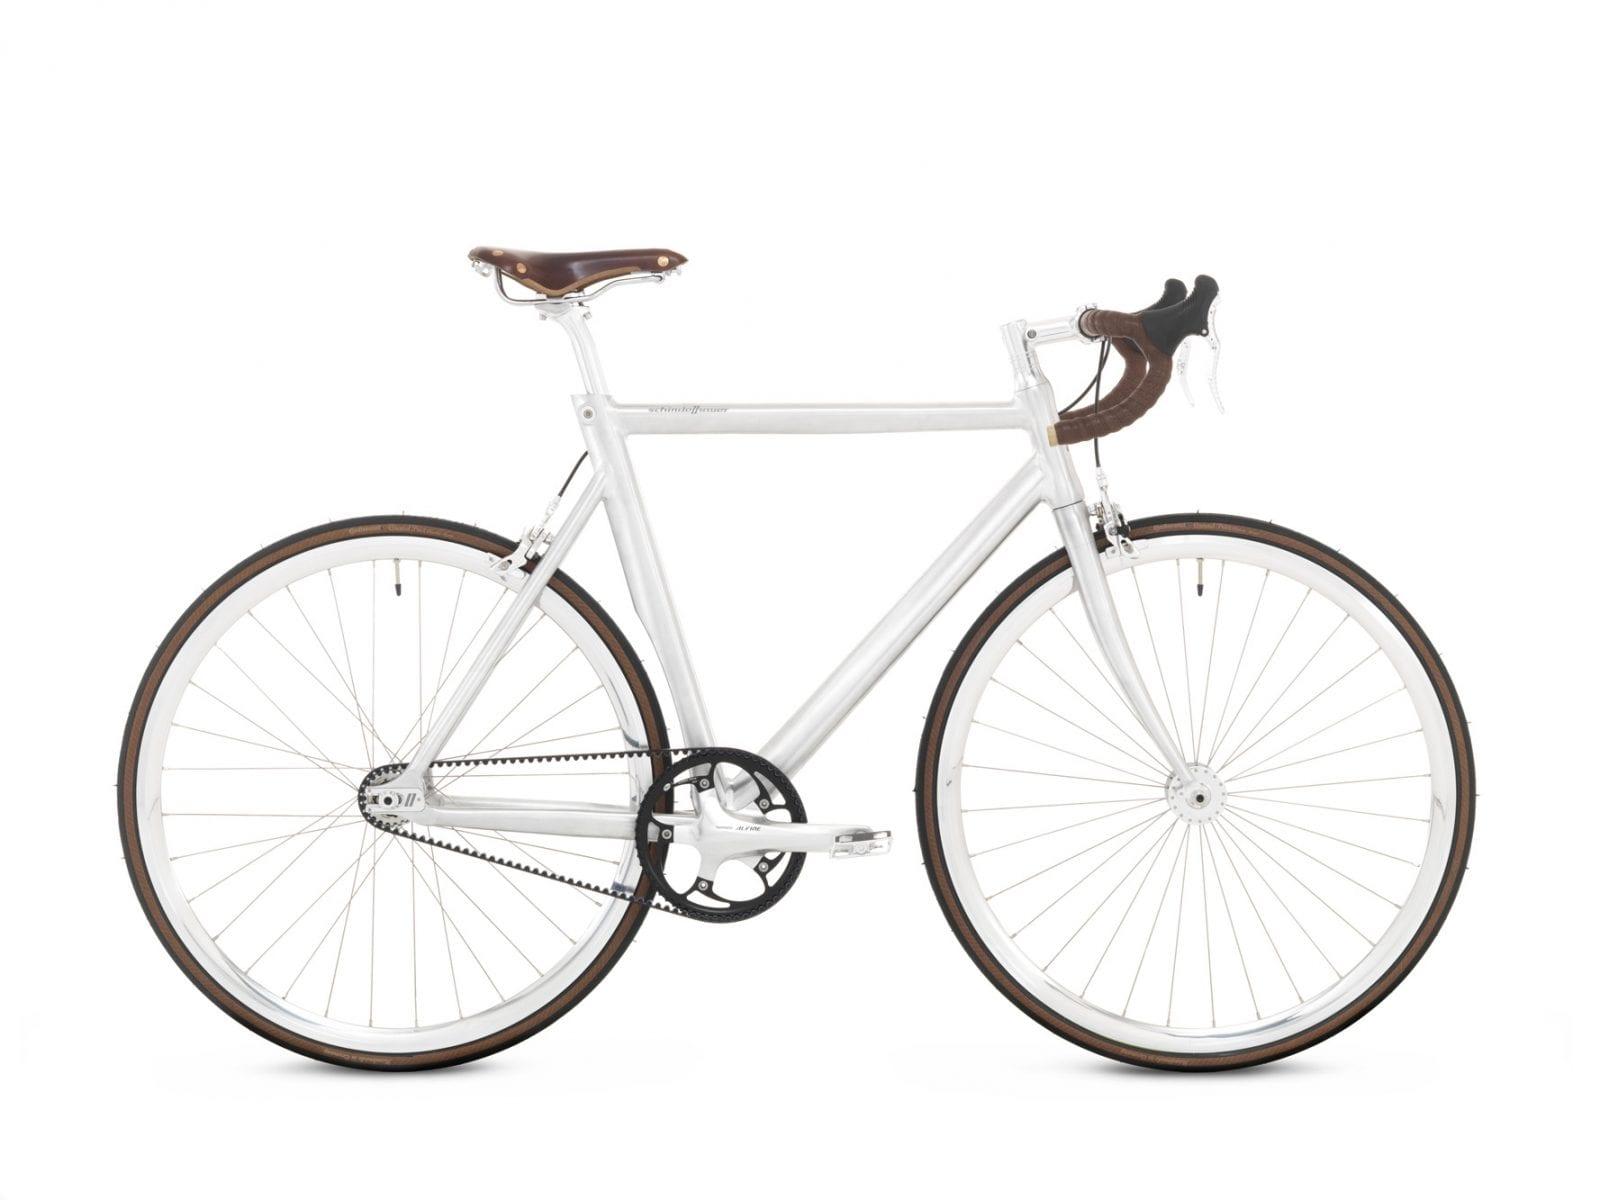 Siegfried_Road_2019_ap_Vuk_Bikes_Madrid